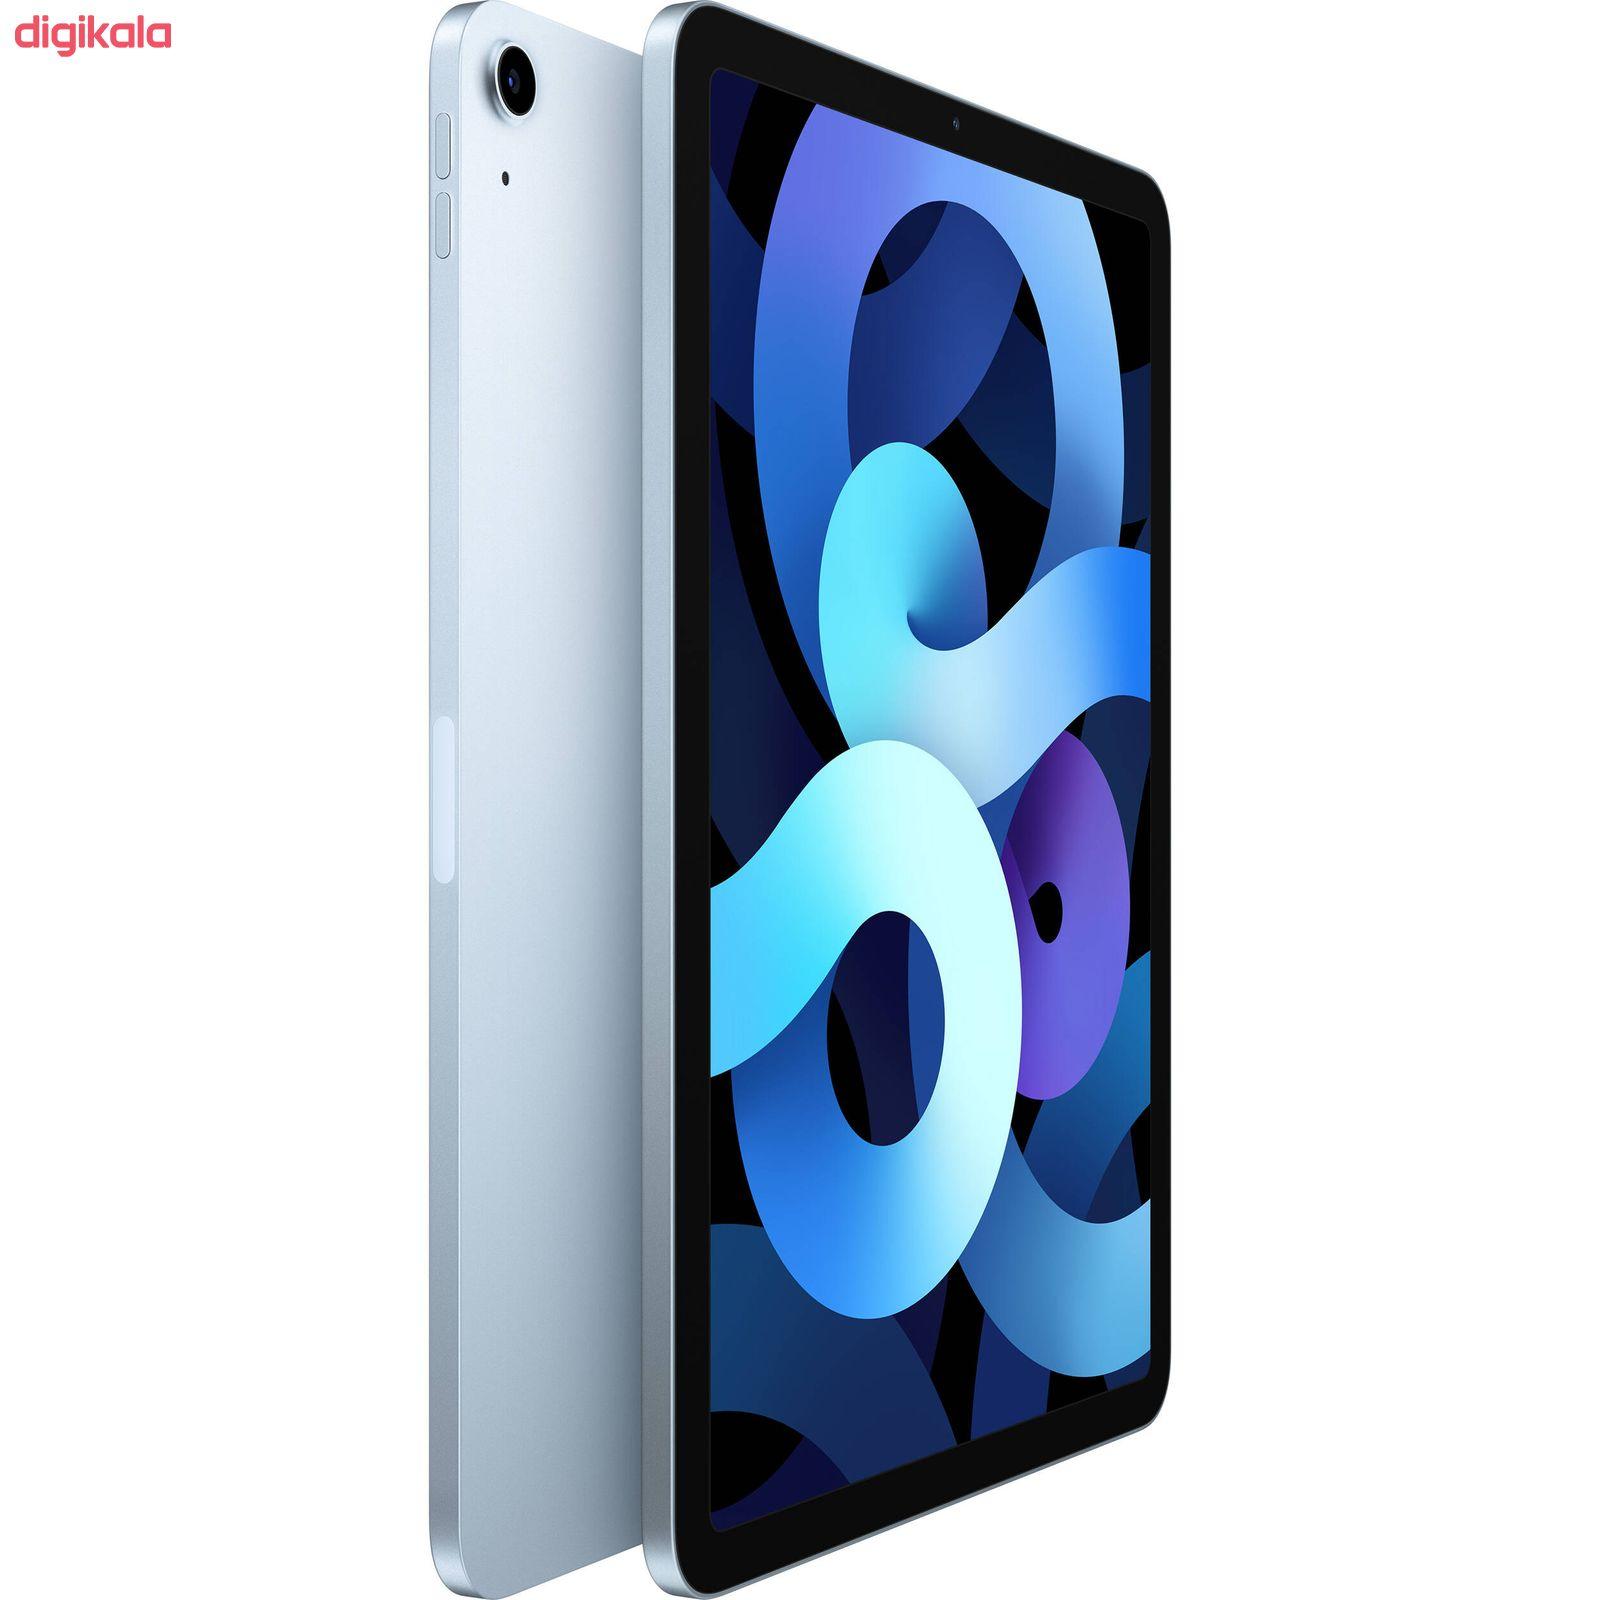 تبلت اپل مدل iPad Air 10.9 inch 2020 WiFi ظرفیت 64 گیگابایت  main 1 2